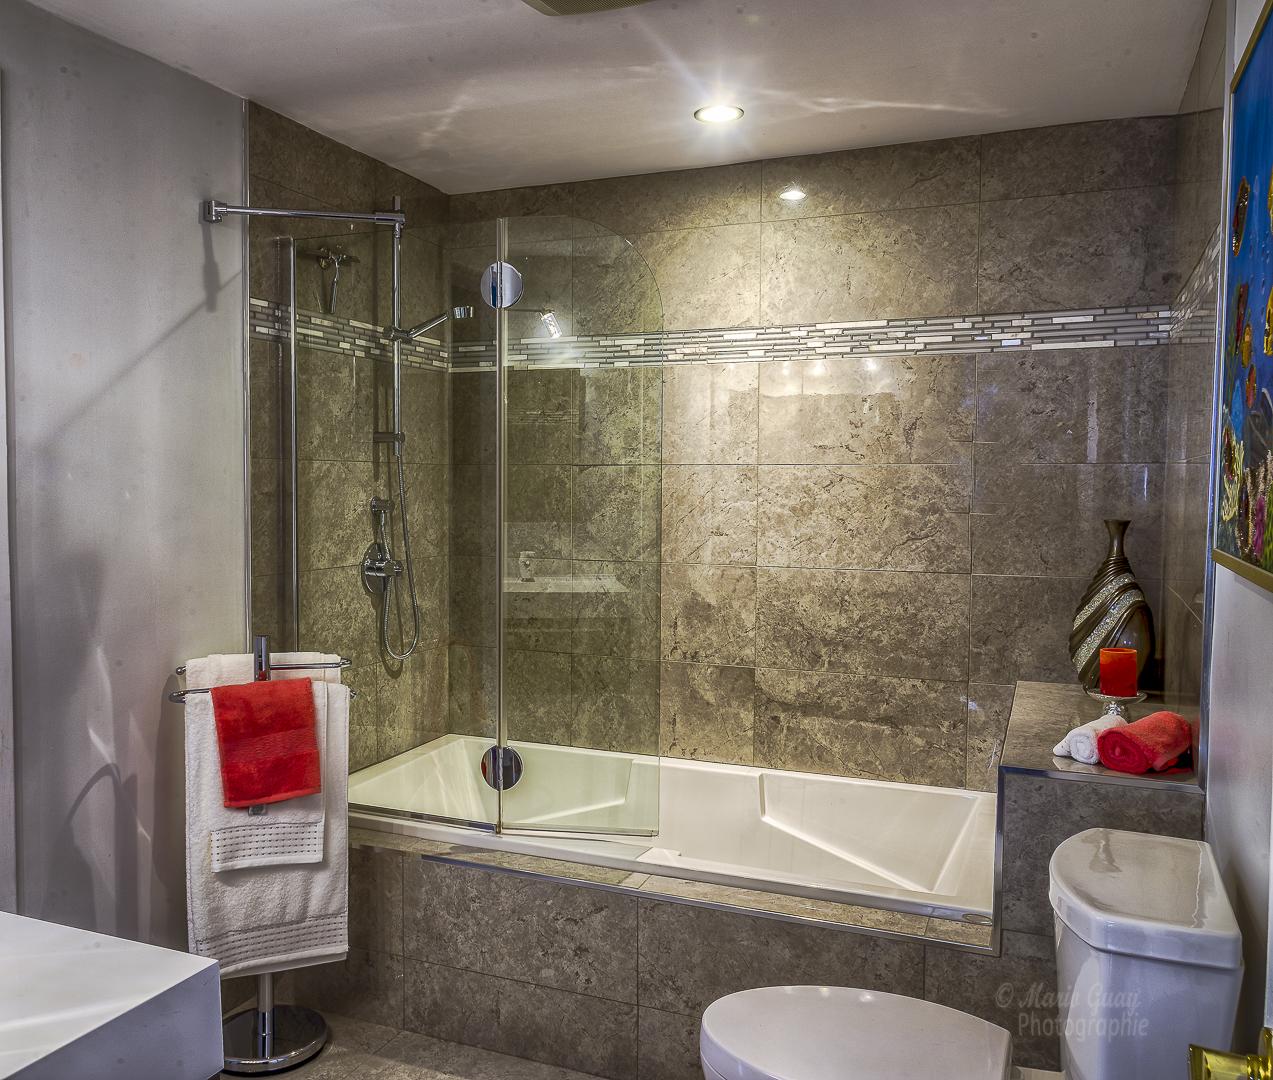 Salle de bain r novations yan boucher for Modifier salle de bain